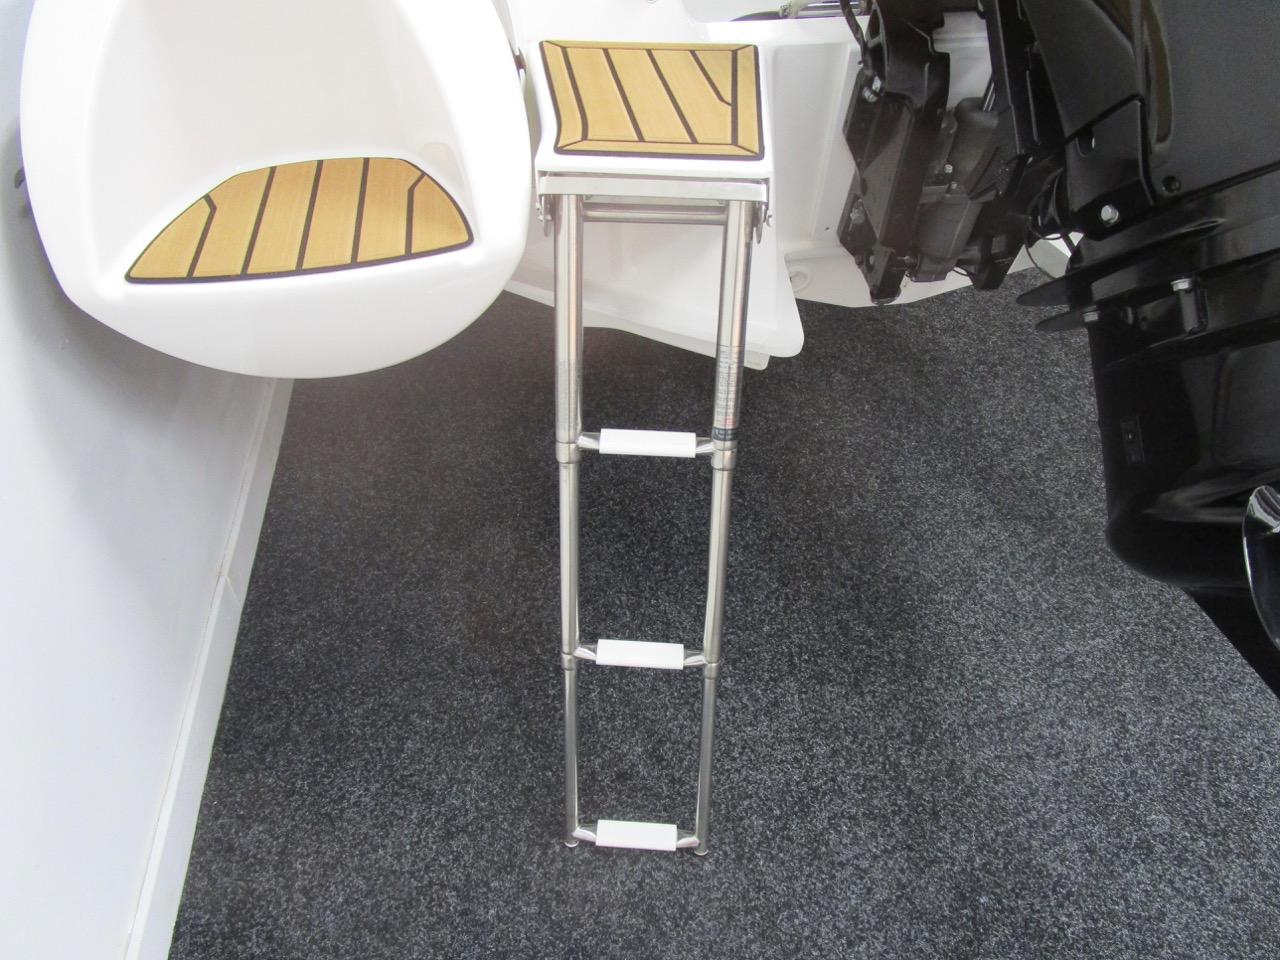 GRAND G500 RIB port side bathing ladder down